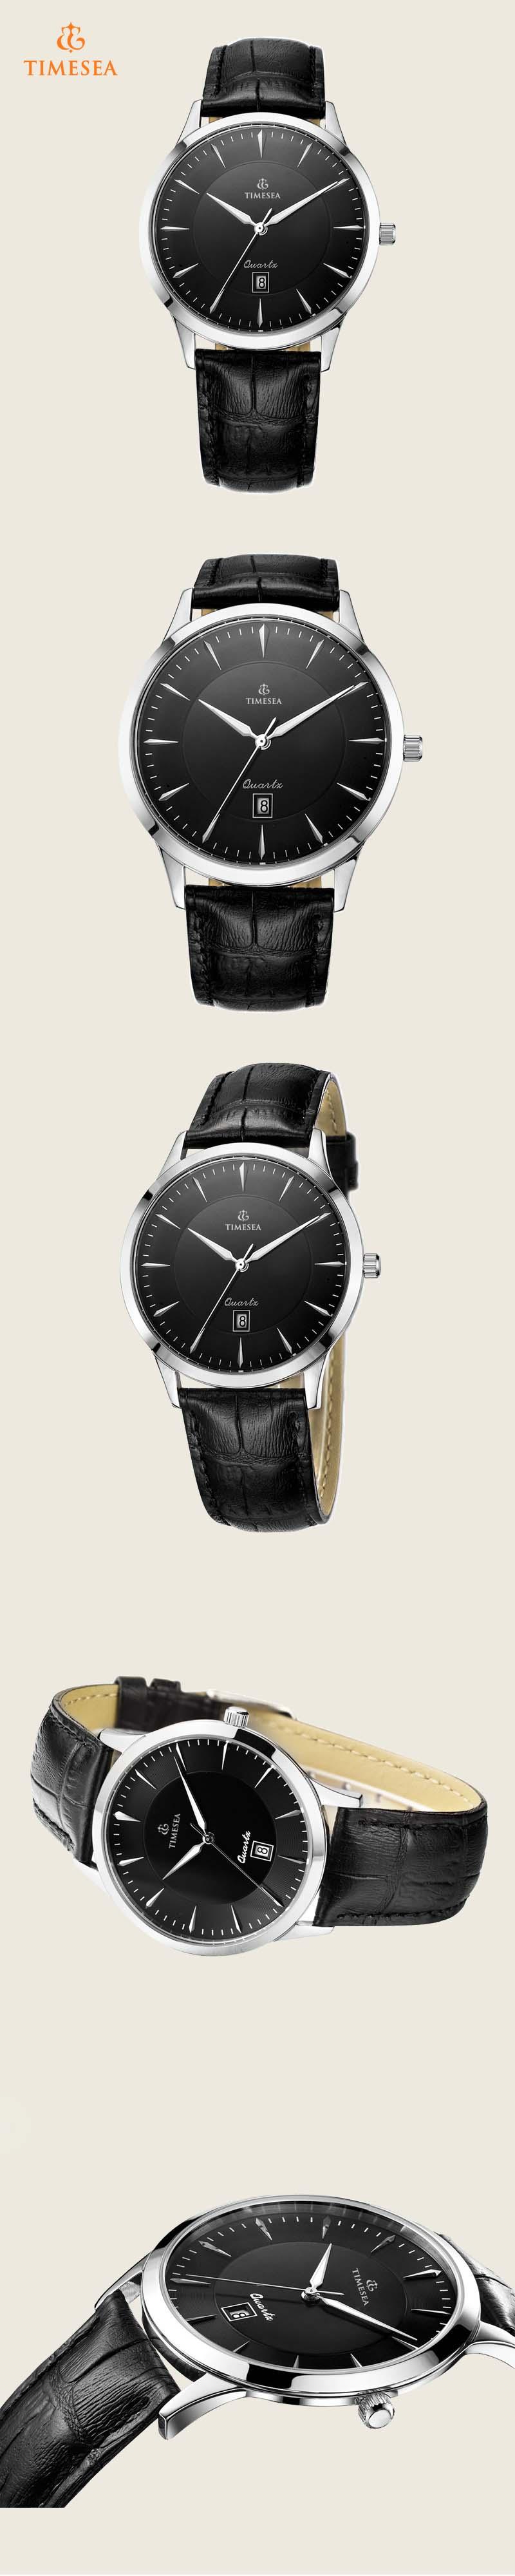 Men's Date Quartz Watch with Black Leather Strap 72271